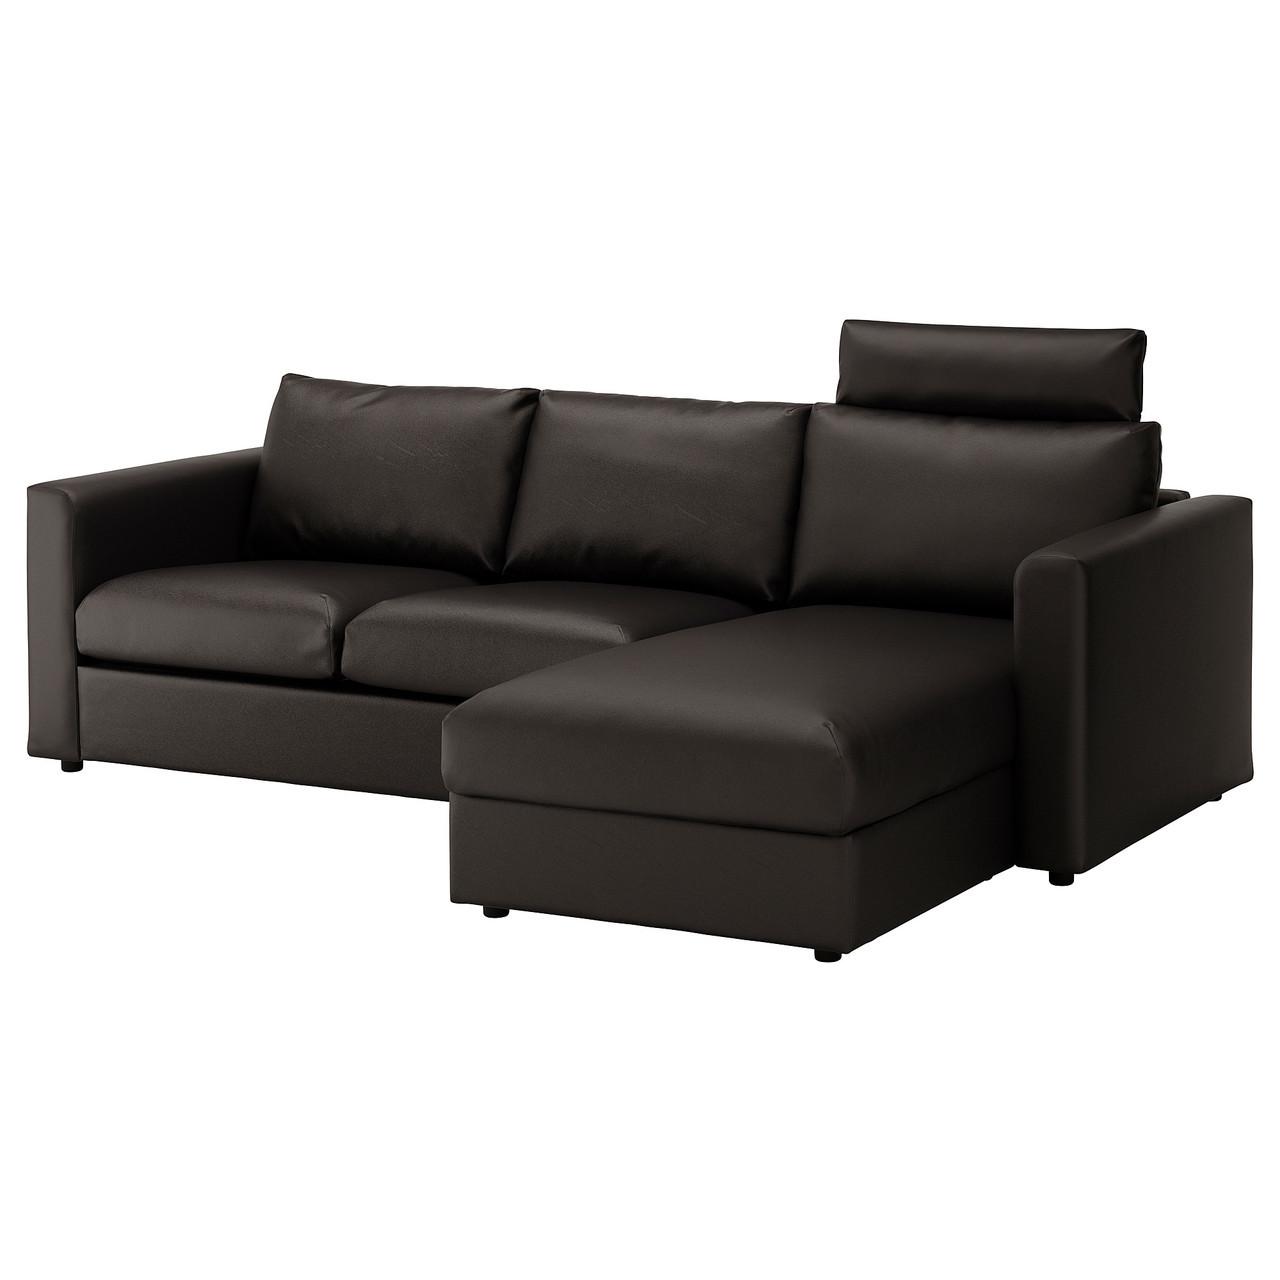 IKEA VIMLE (592.566.83) 3-местный диван, с шезлонгом